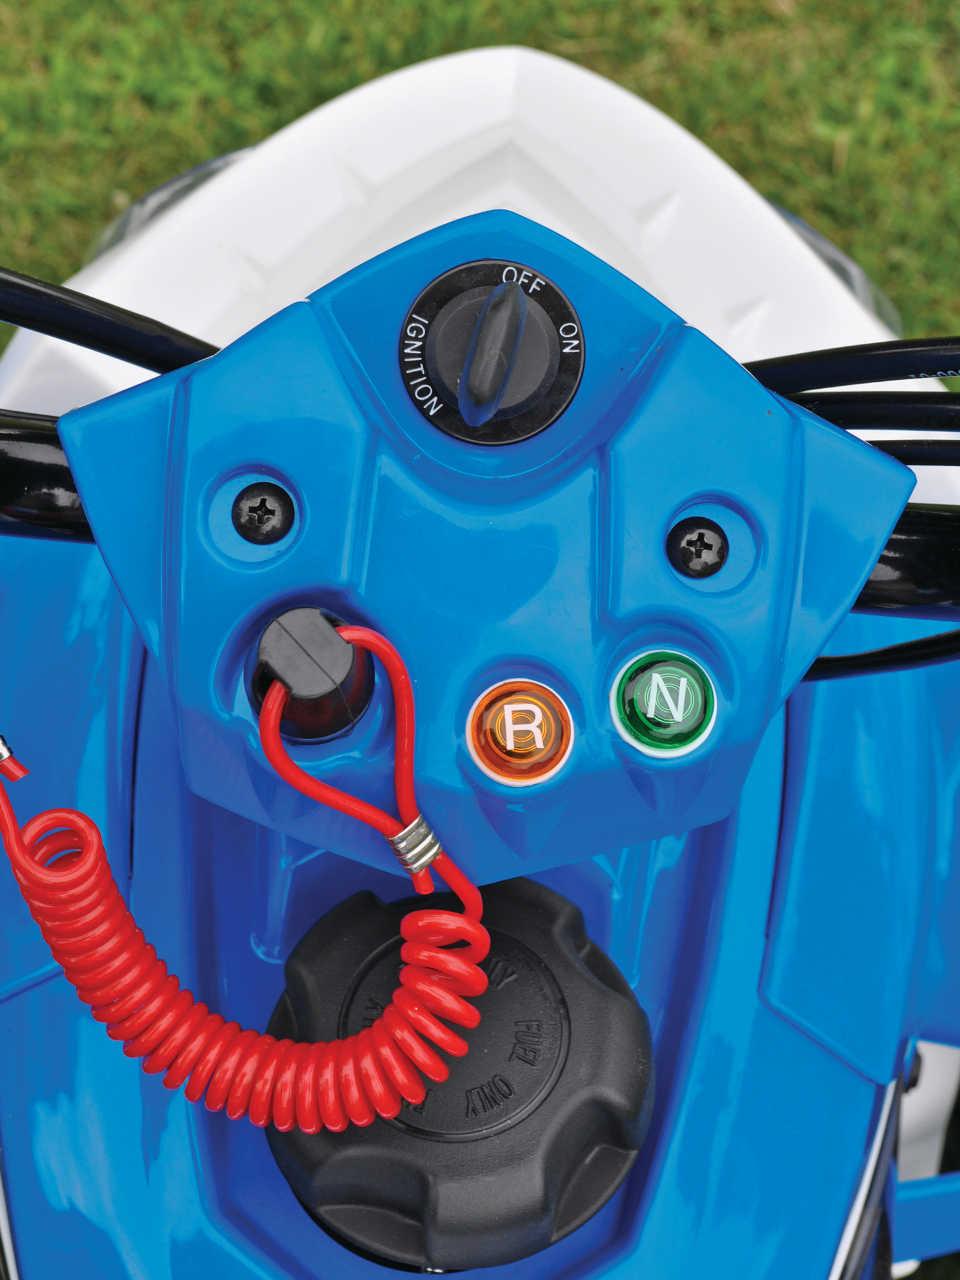 Mini Quad Test The Polaris Outlaw 90 Atv Illustrated Predator Fuel Filter 2014polarisoutlaw90close Upconsole